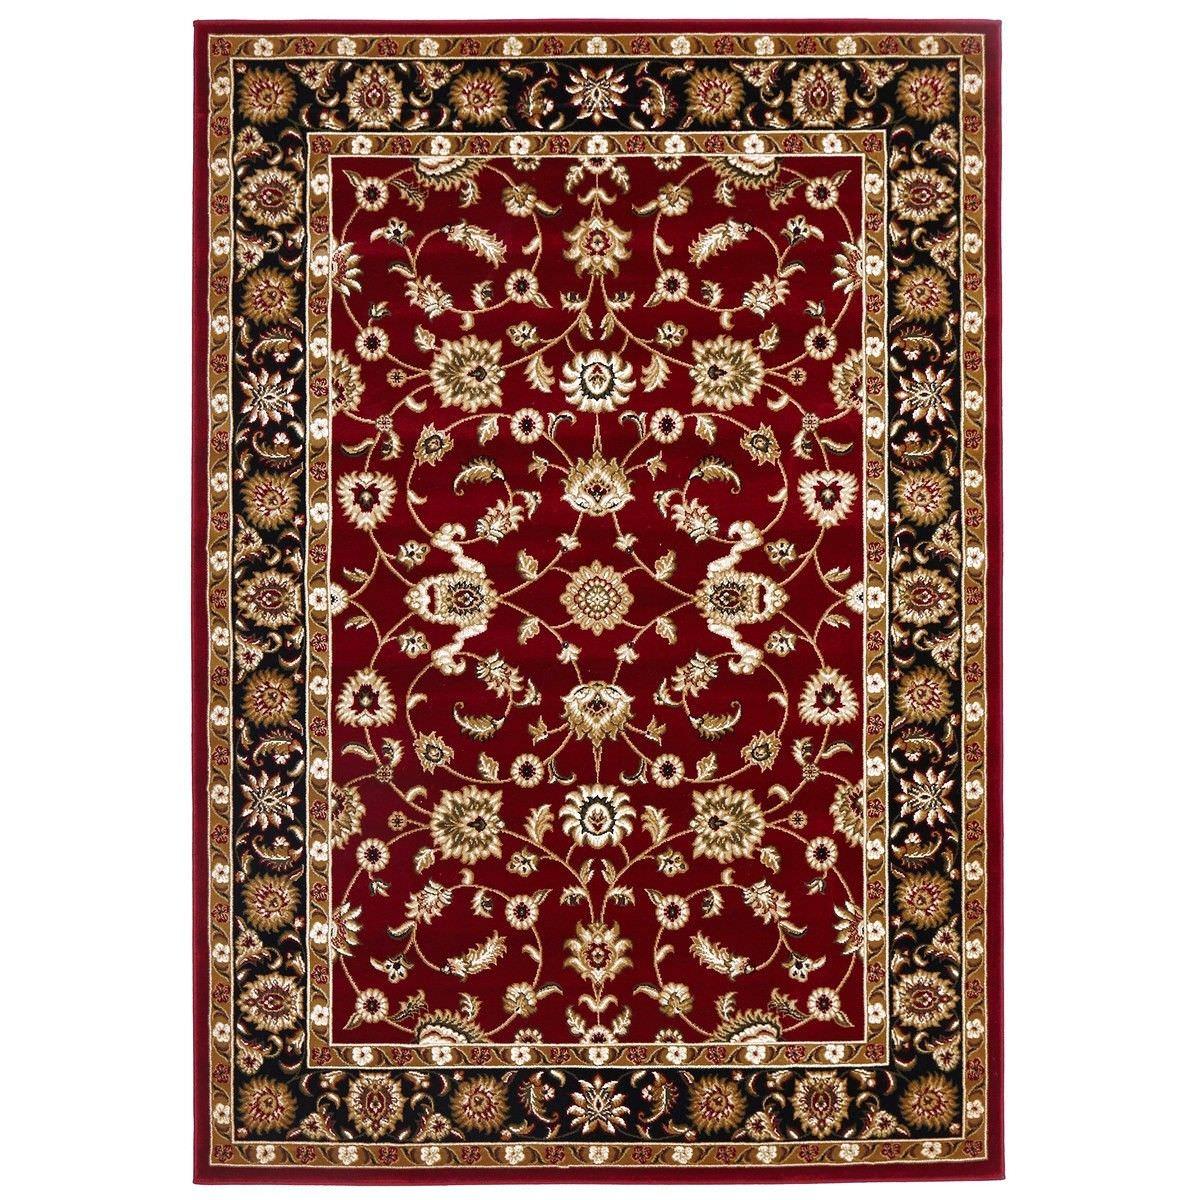 Sydney Classic Turkish Made Oriental Rug, 170x120cm, Red / Black